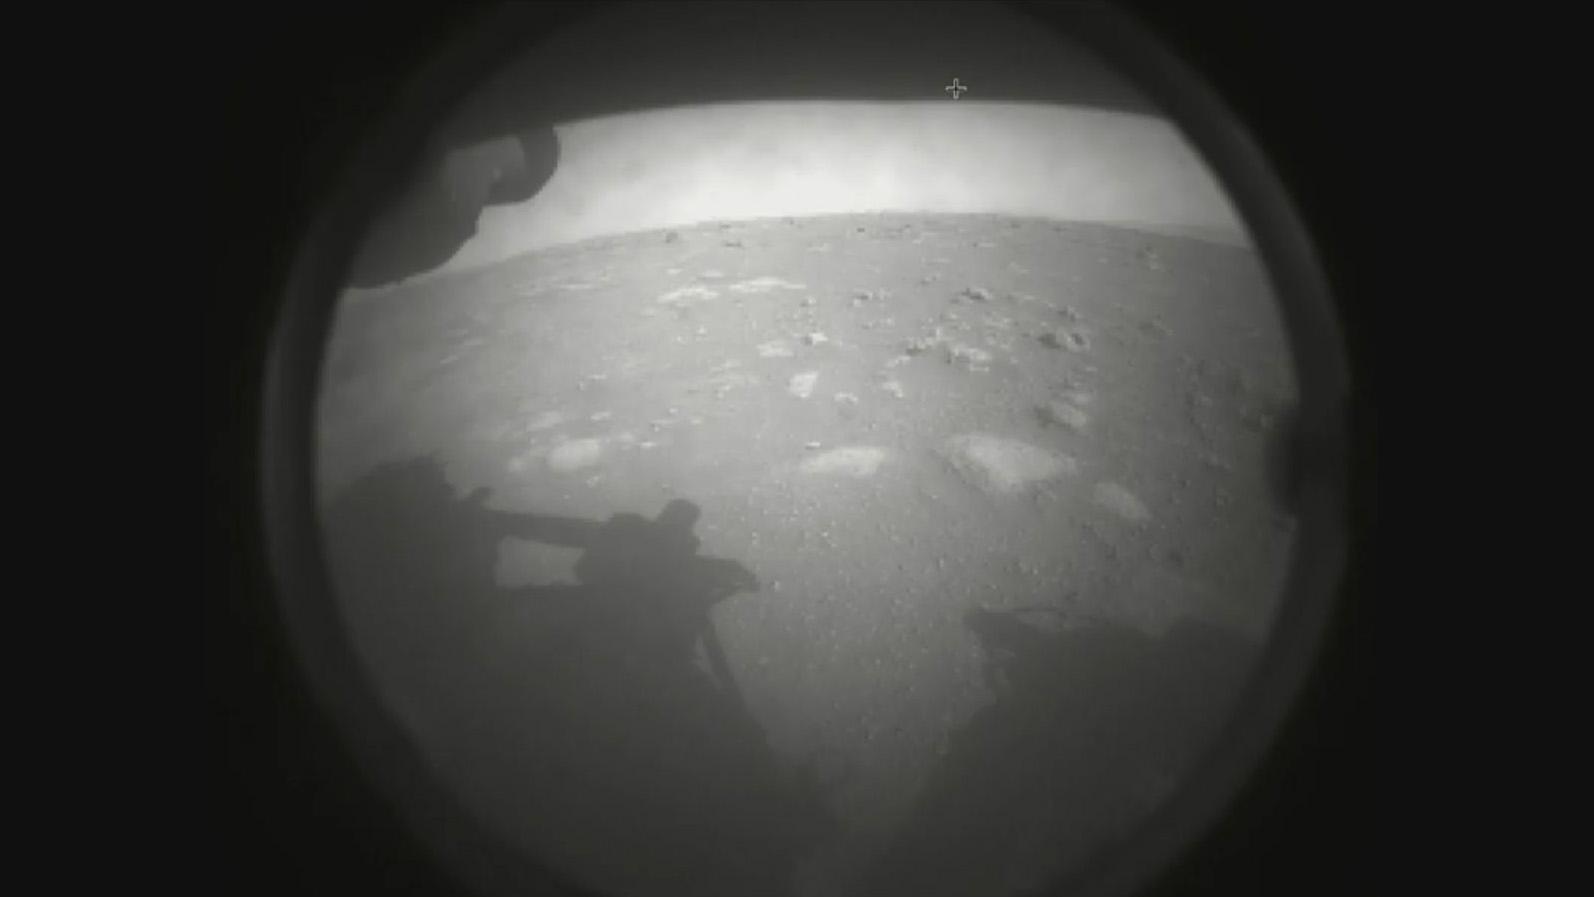 What's next for NASA's Perseverance Mars rover following its landing success? thumbnail